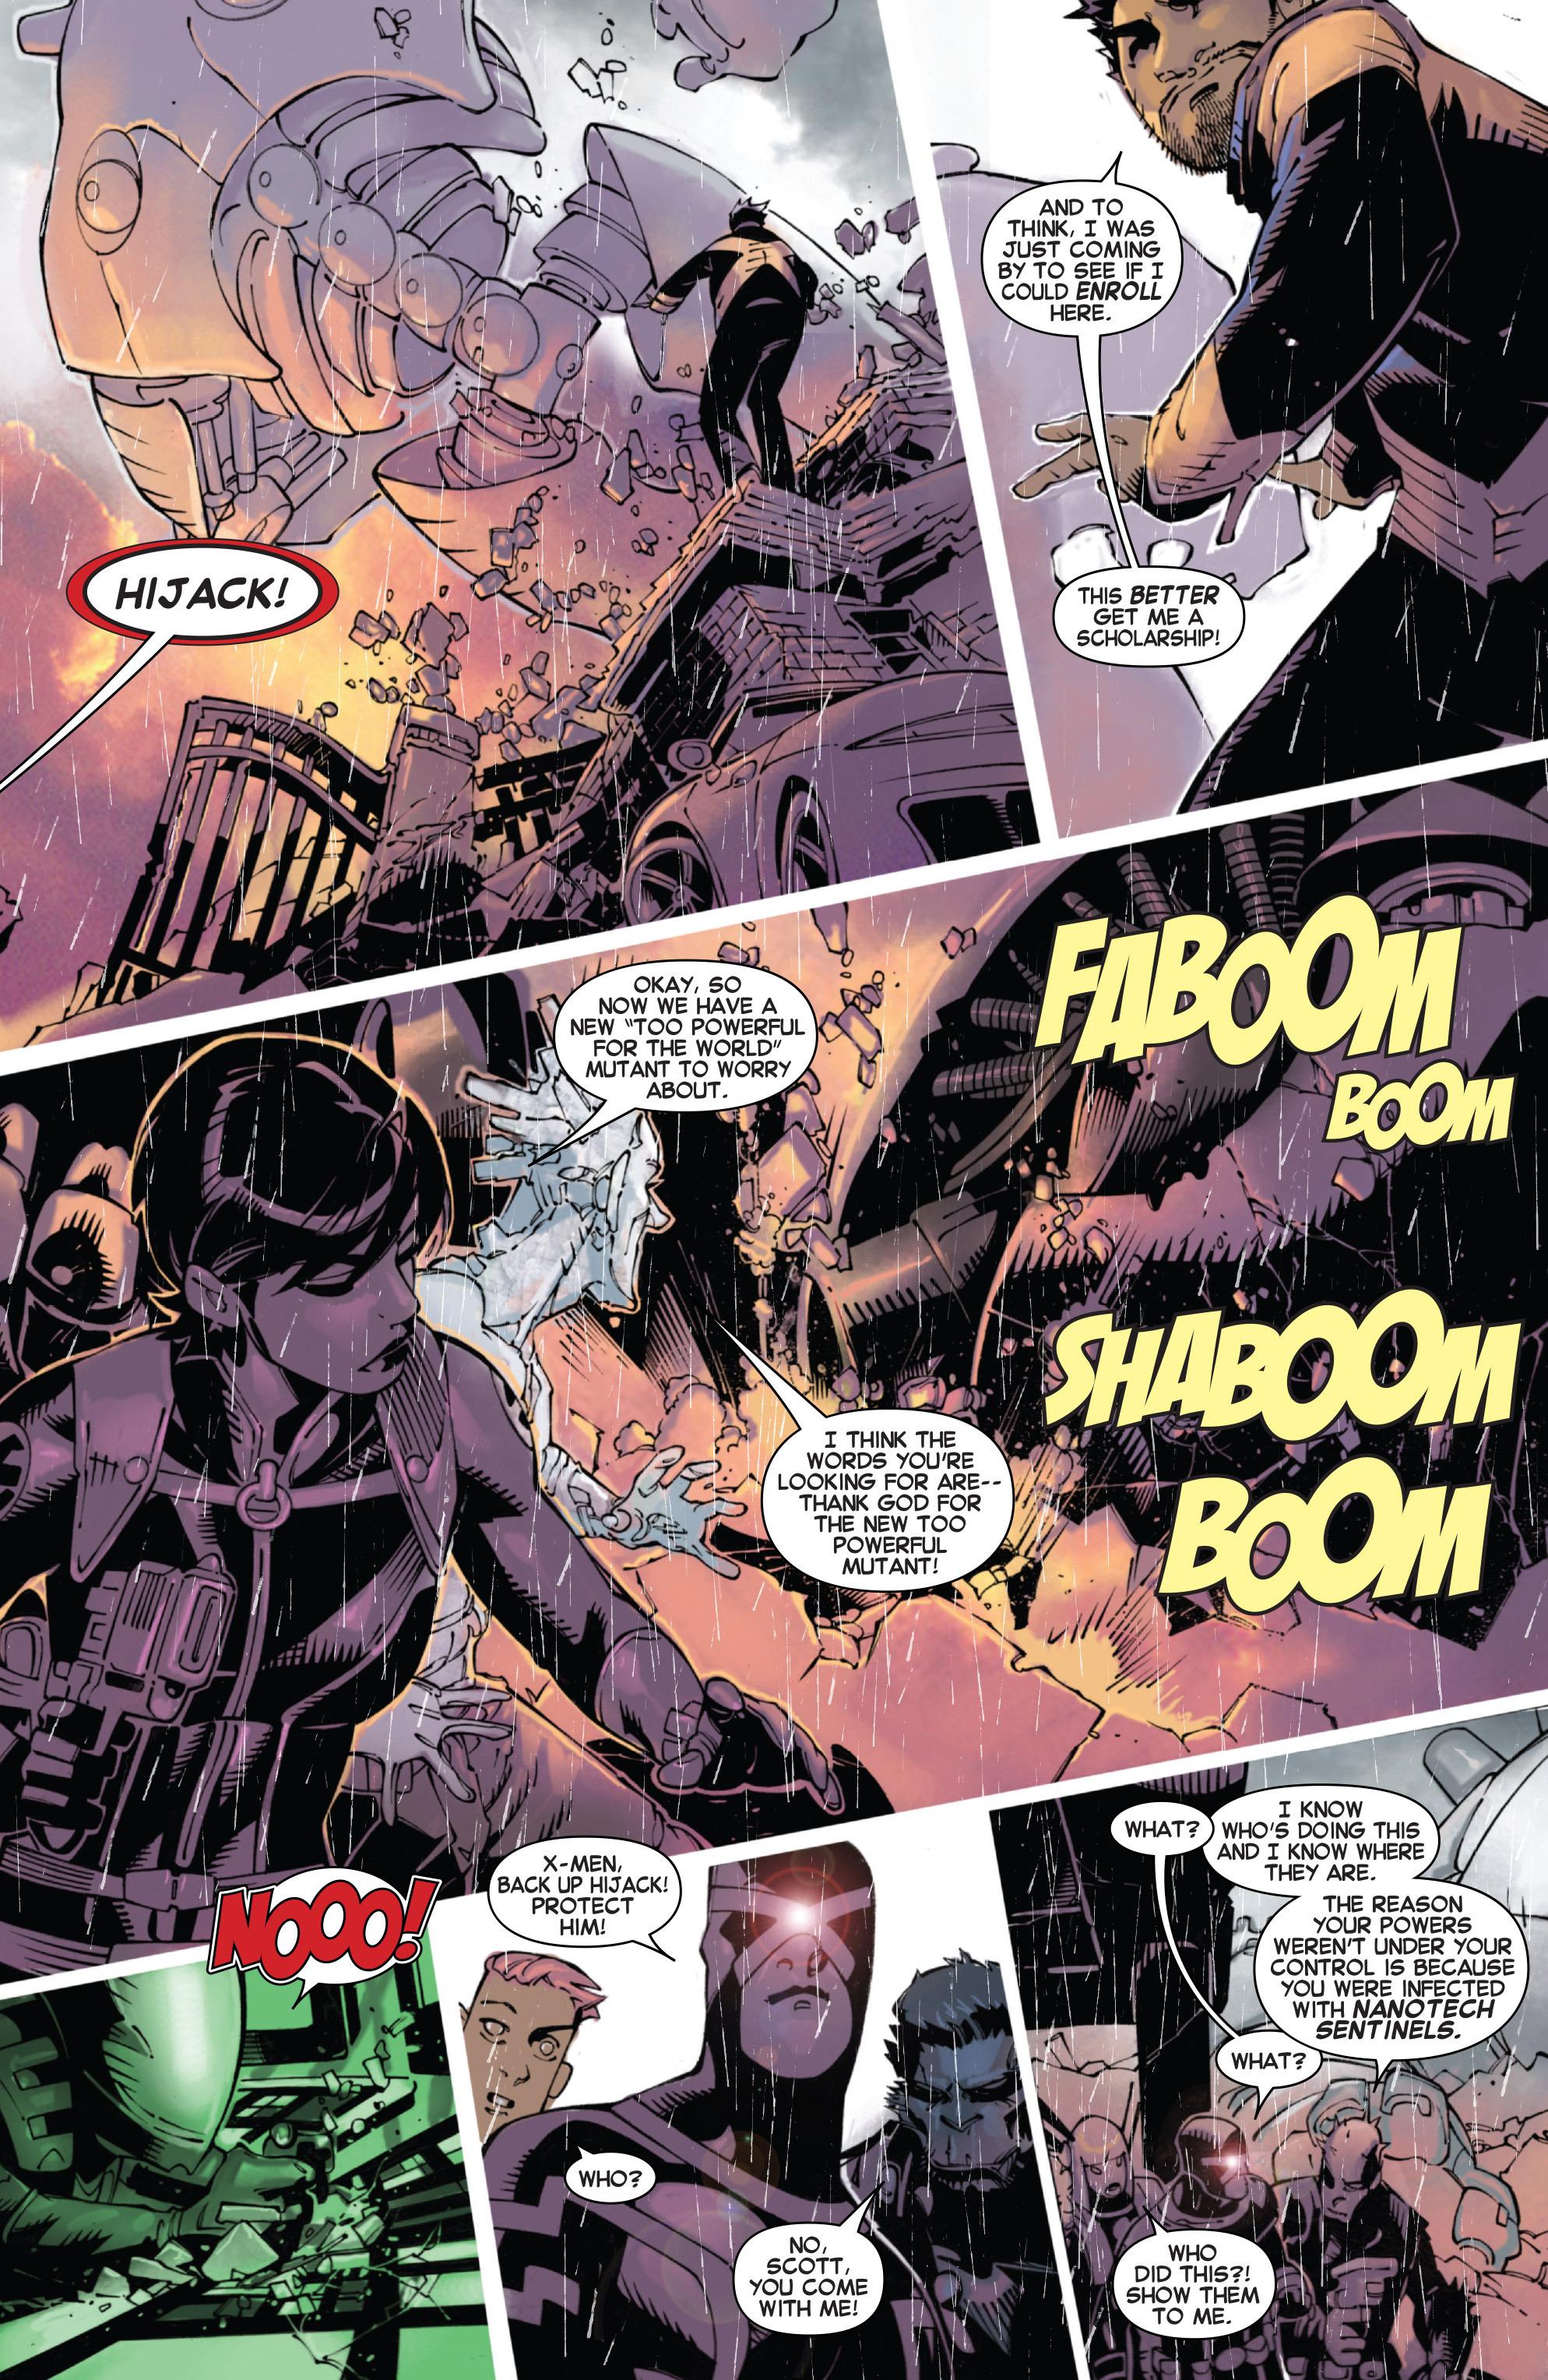 Read online Uncanny X-Men (2013) comic -  Issue # _TPB 4 - vs. S.H.I.E.L.D - 72